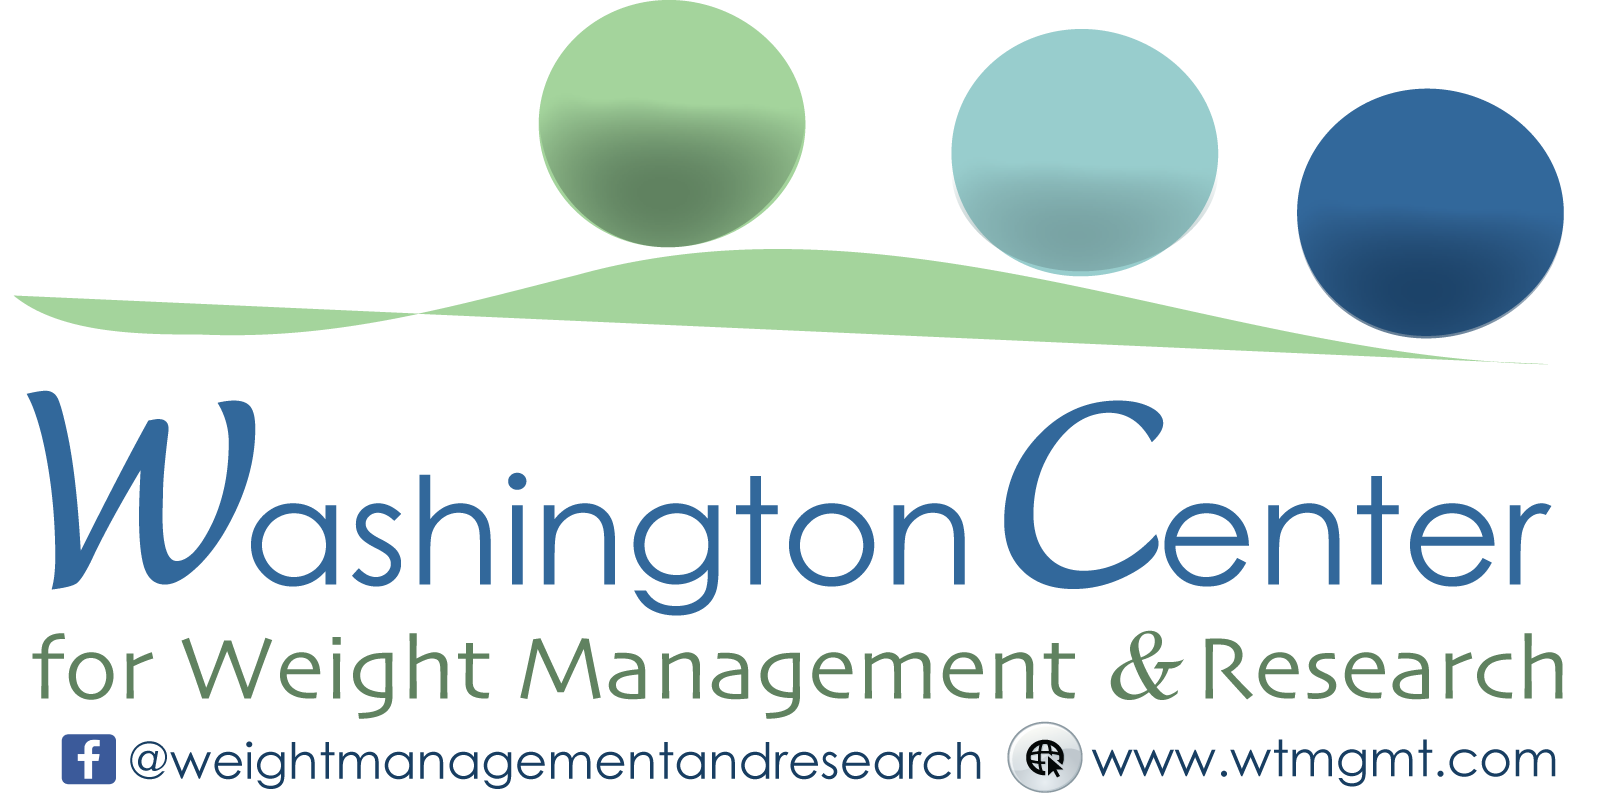 Weight Loss Medicine Arlington Dc Washington Center Weight Mgmt Res